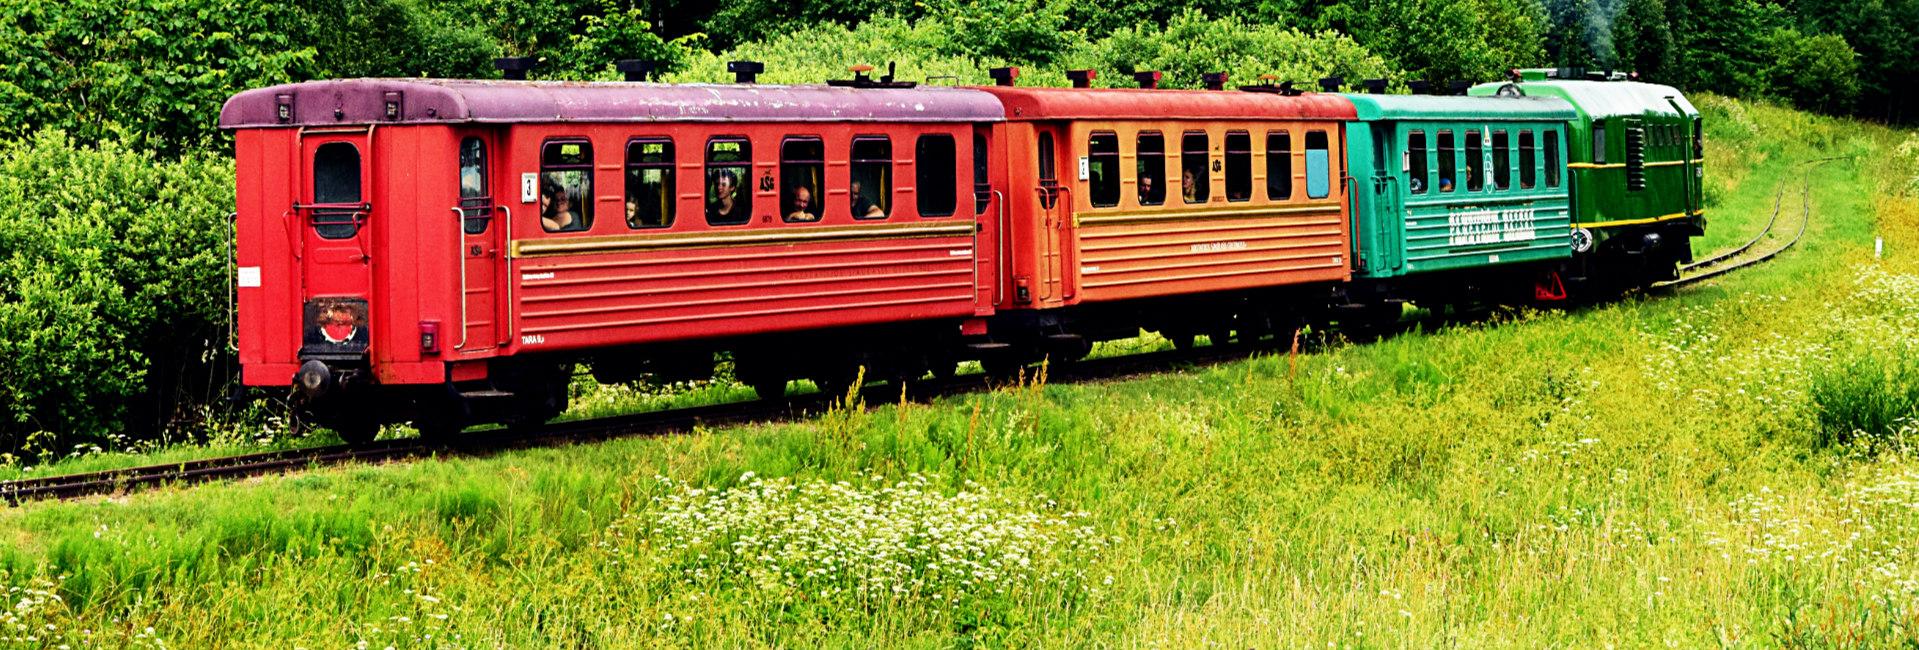 Oldtimer-Züge